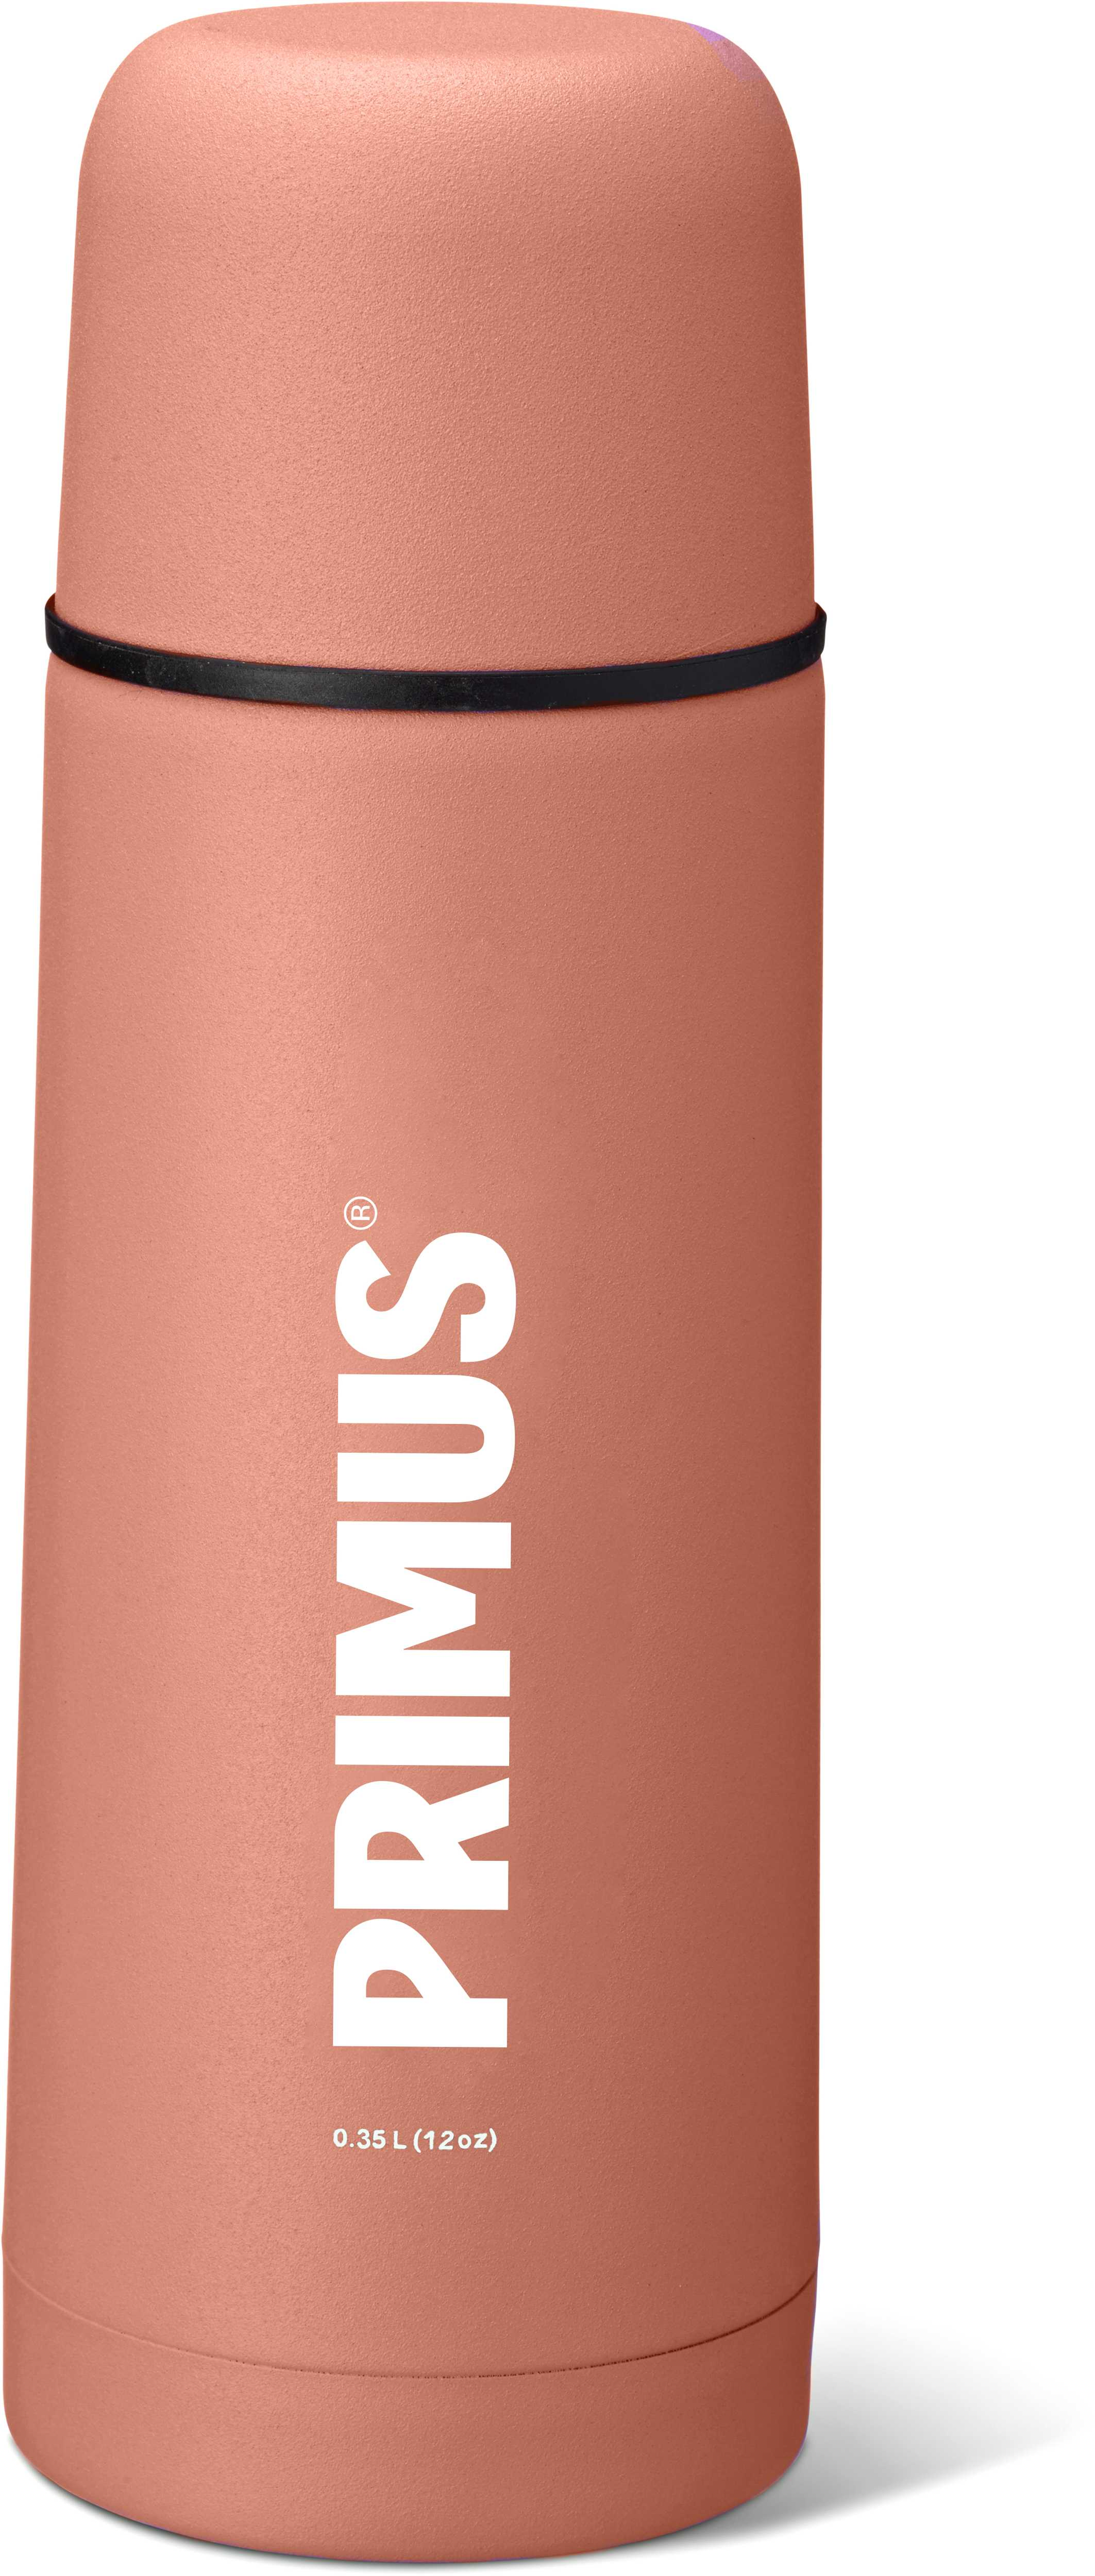 Termosflaska Primus Vacuum Bottle 350 ml ljusrosa | Bottles